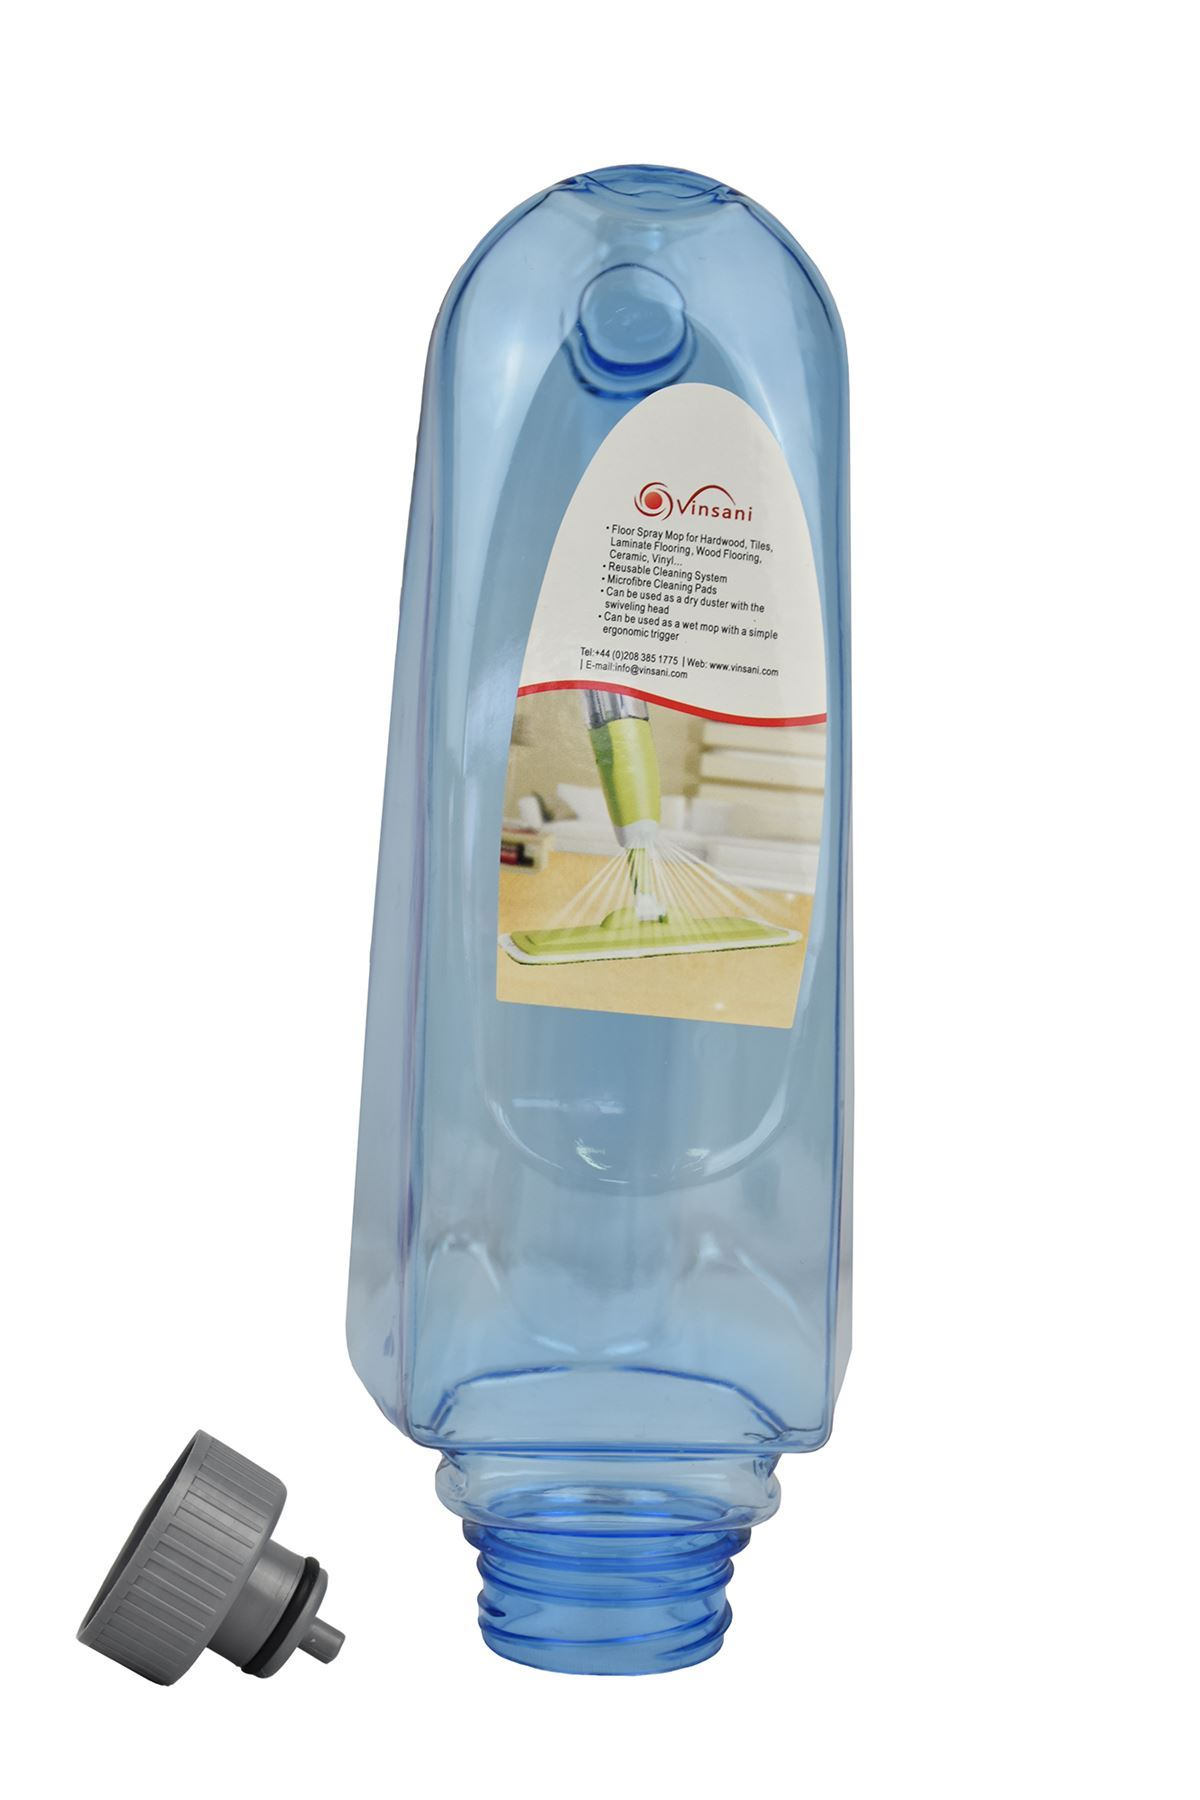 Vinsani Red Floor Spray Mop Water Spraying Floor Cleaner Refillable Bottle Suita